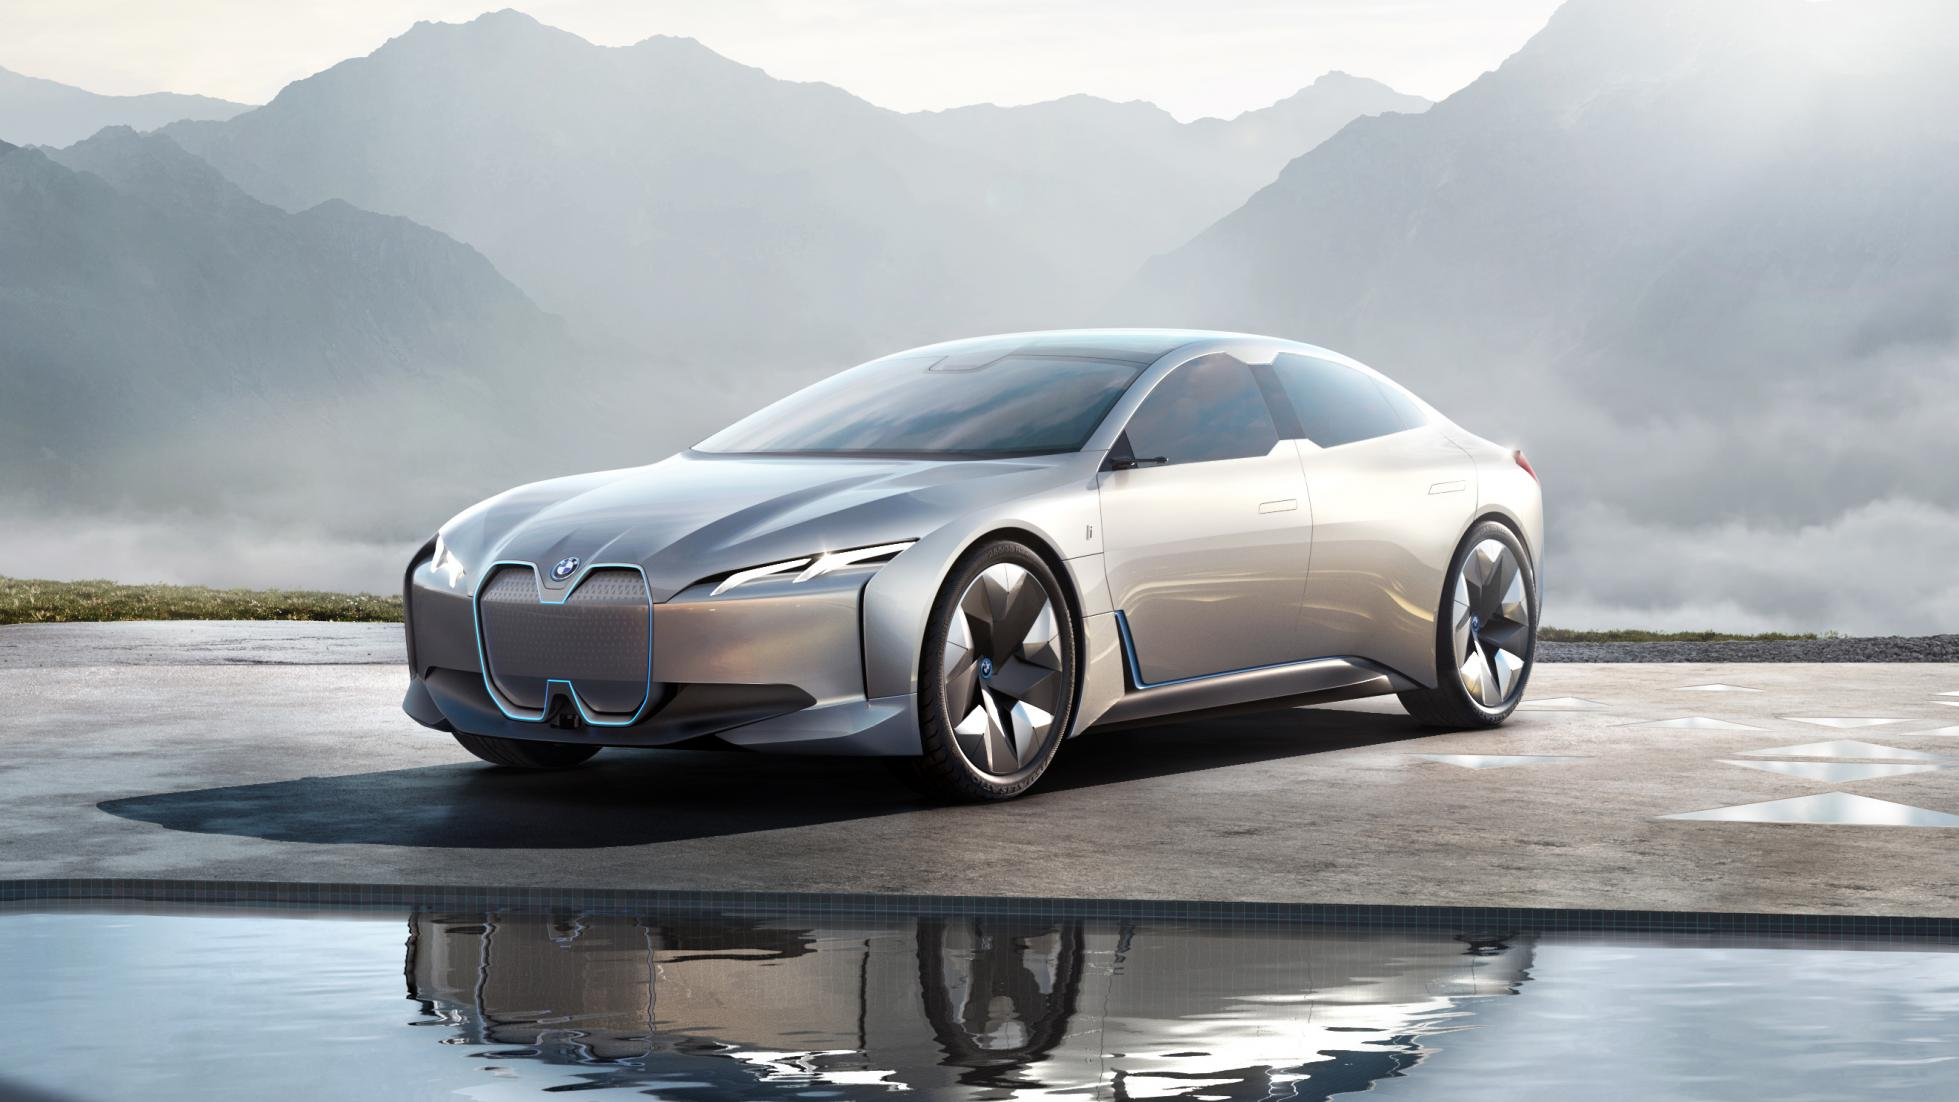 2020 - [BMW] M3/M4 - Page 5 P90276445_highres_bmwi-vision-dynamics